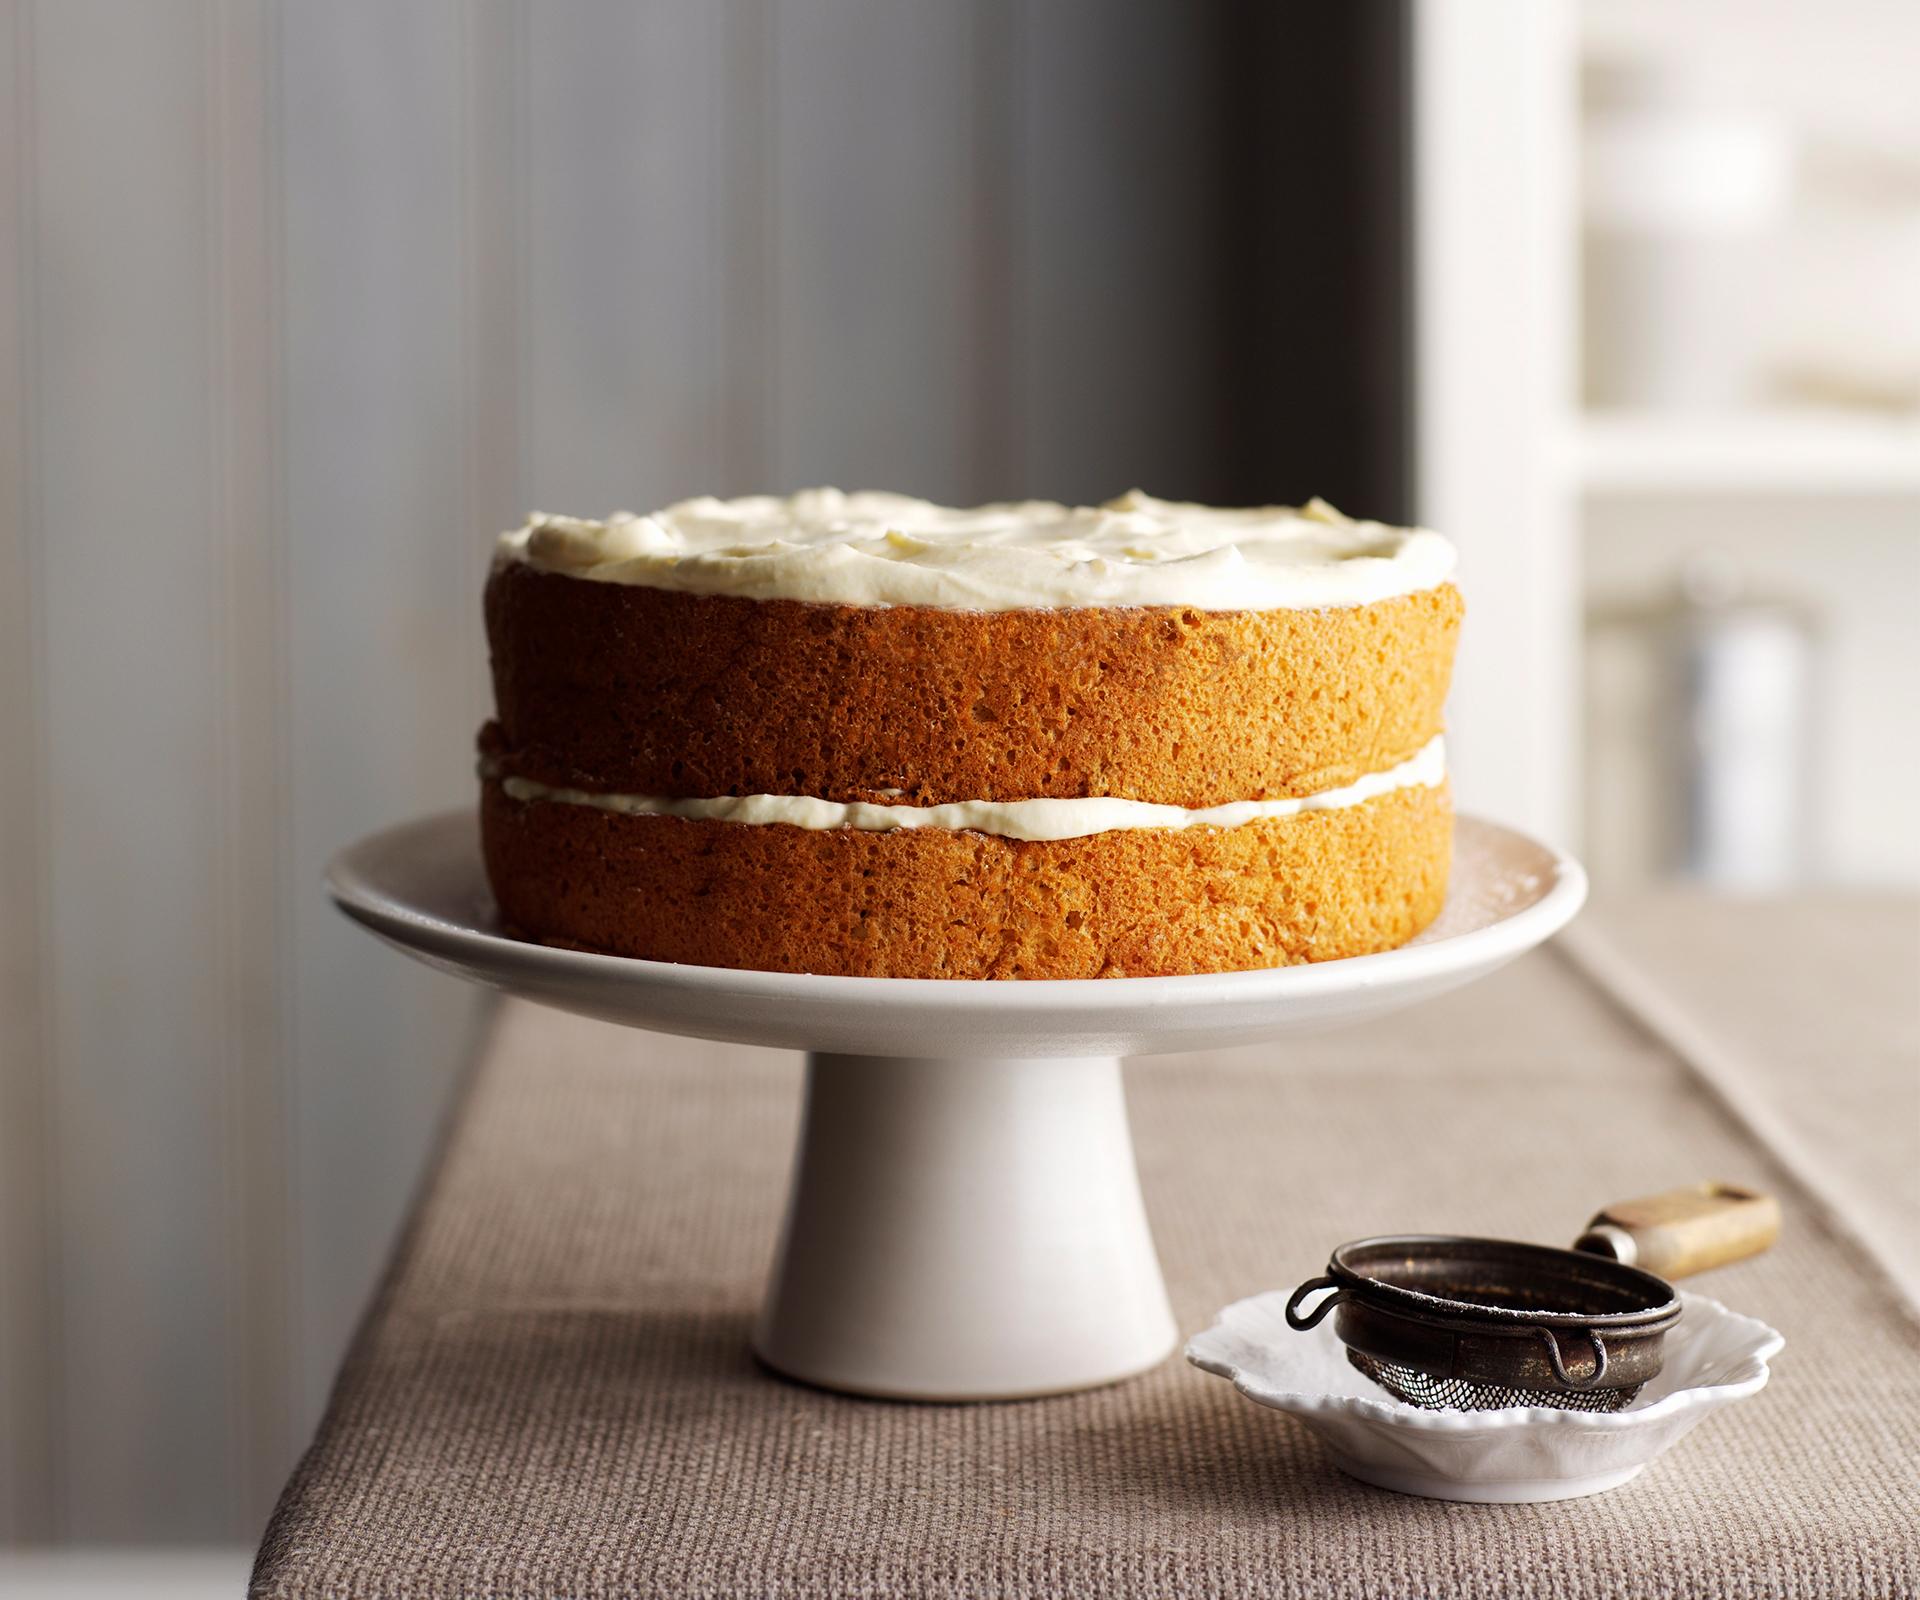 Sponge cake recipe: how to make the perfect sponge cake